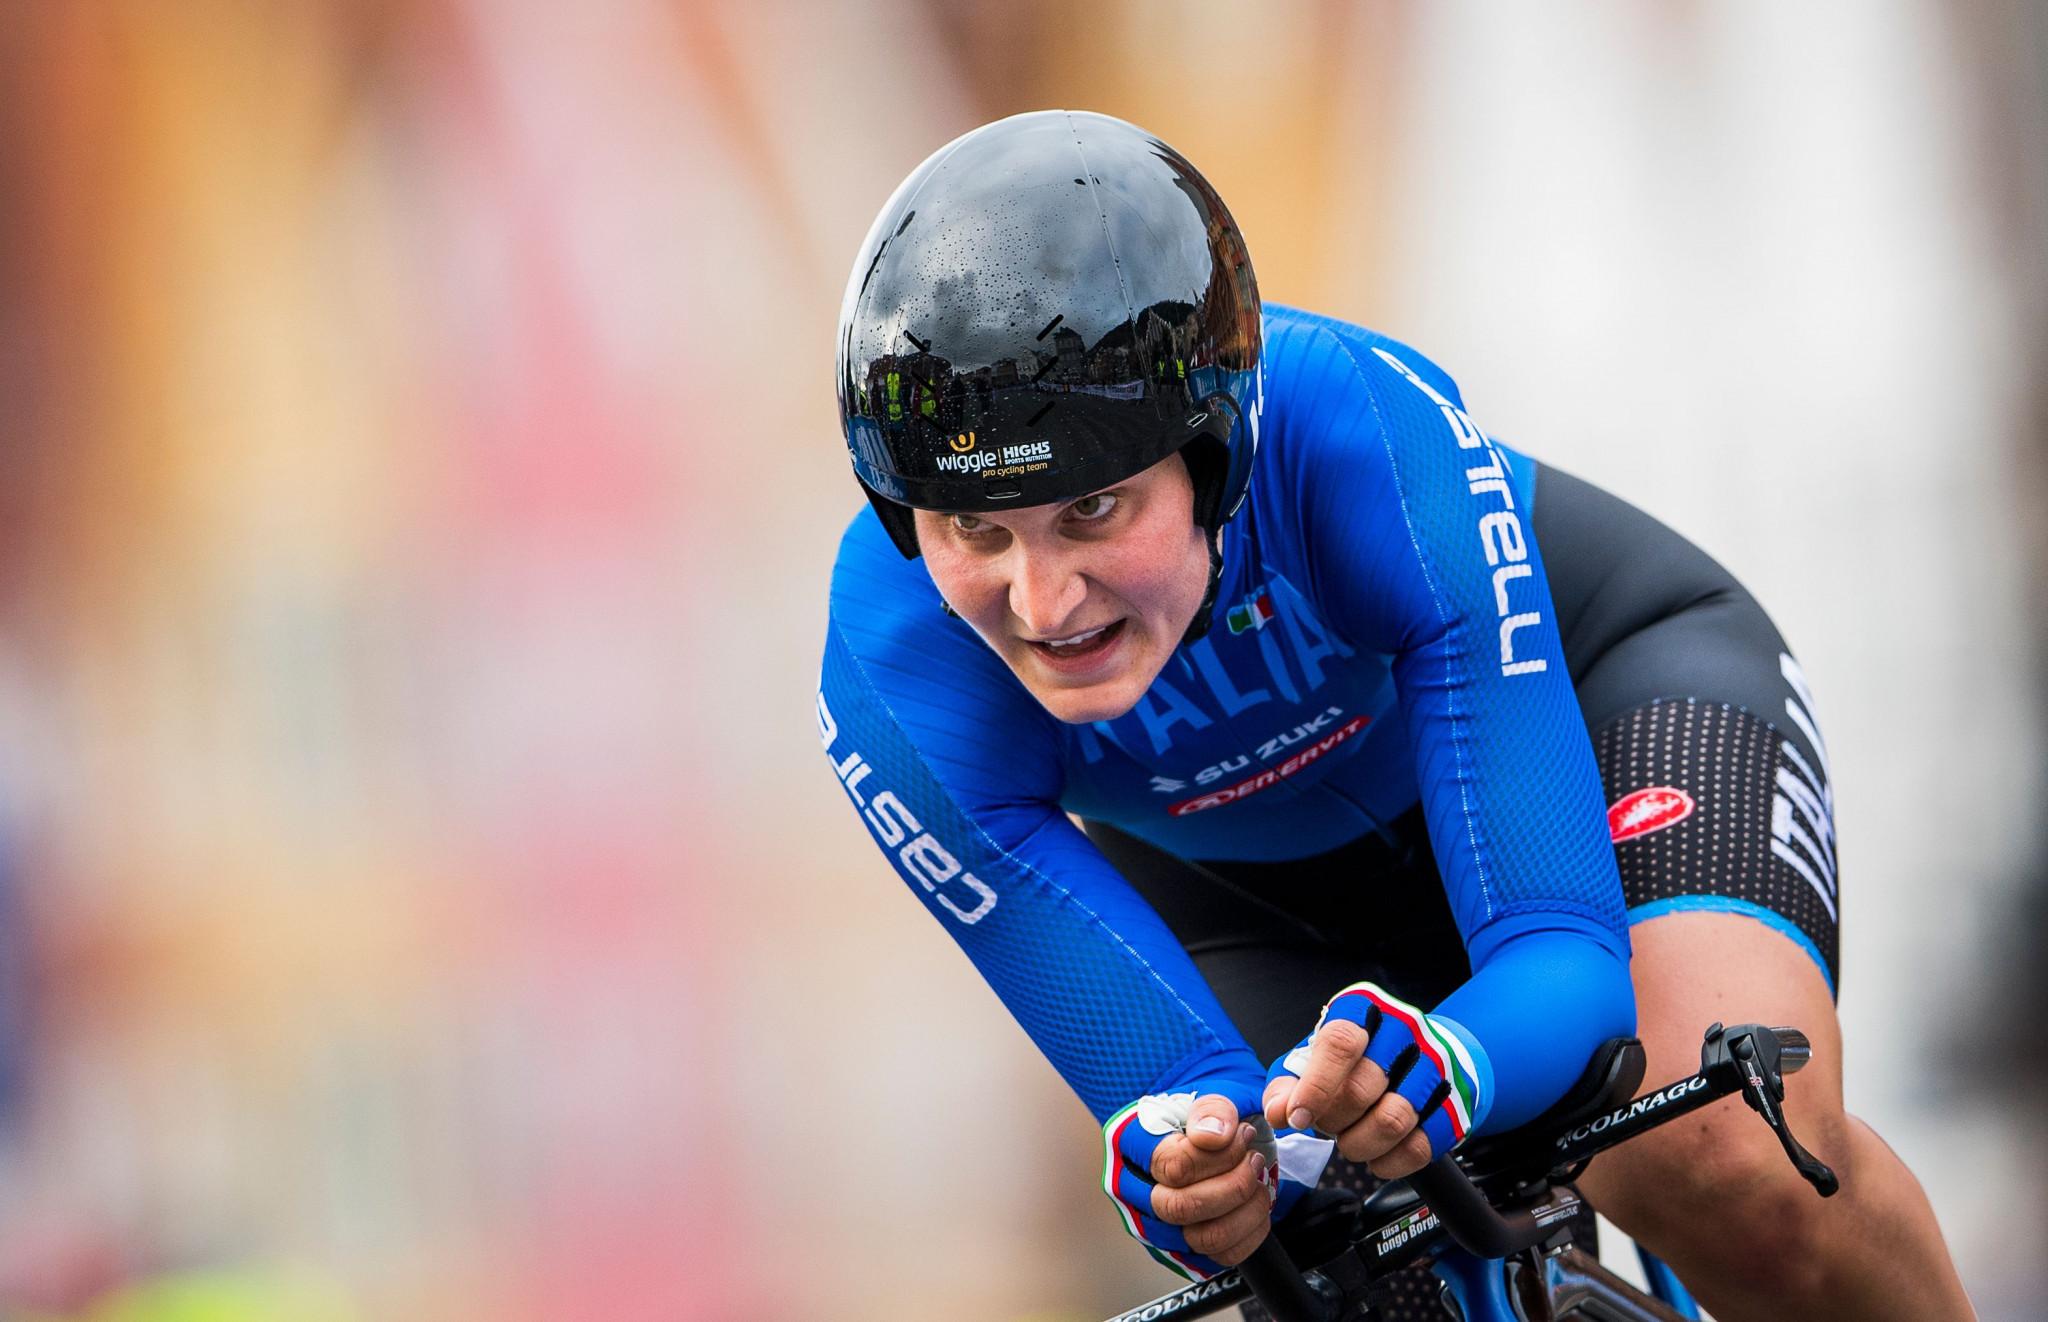 Borghini wins eighth stage of Giro Rosa as Van der Breggen takes leader's jersey